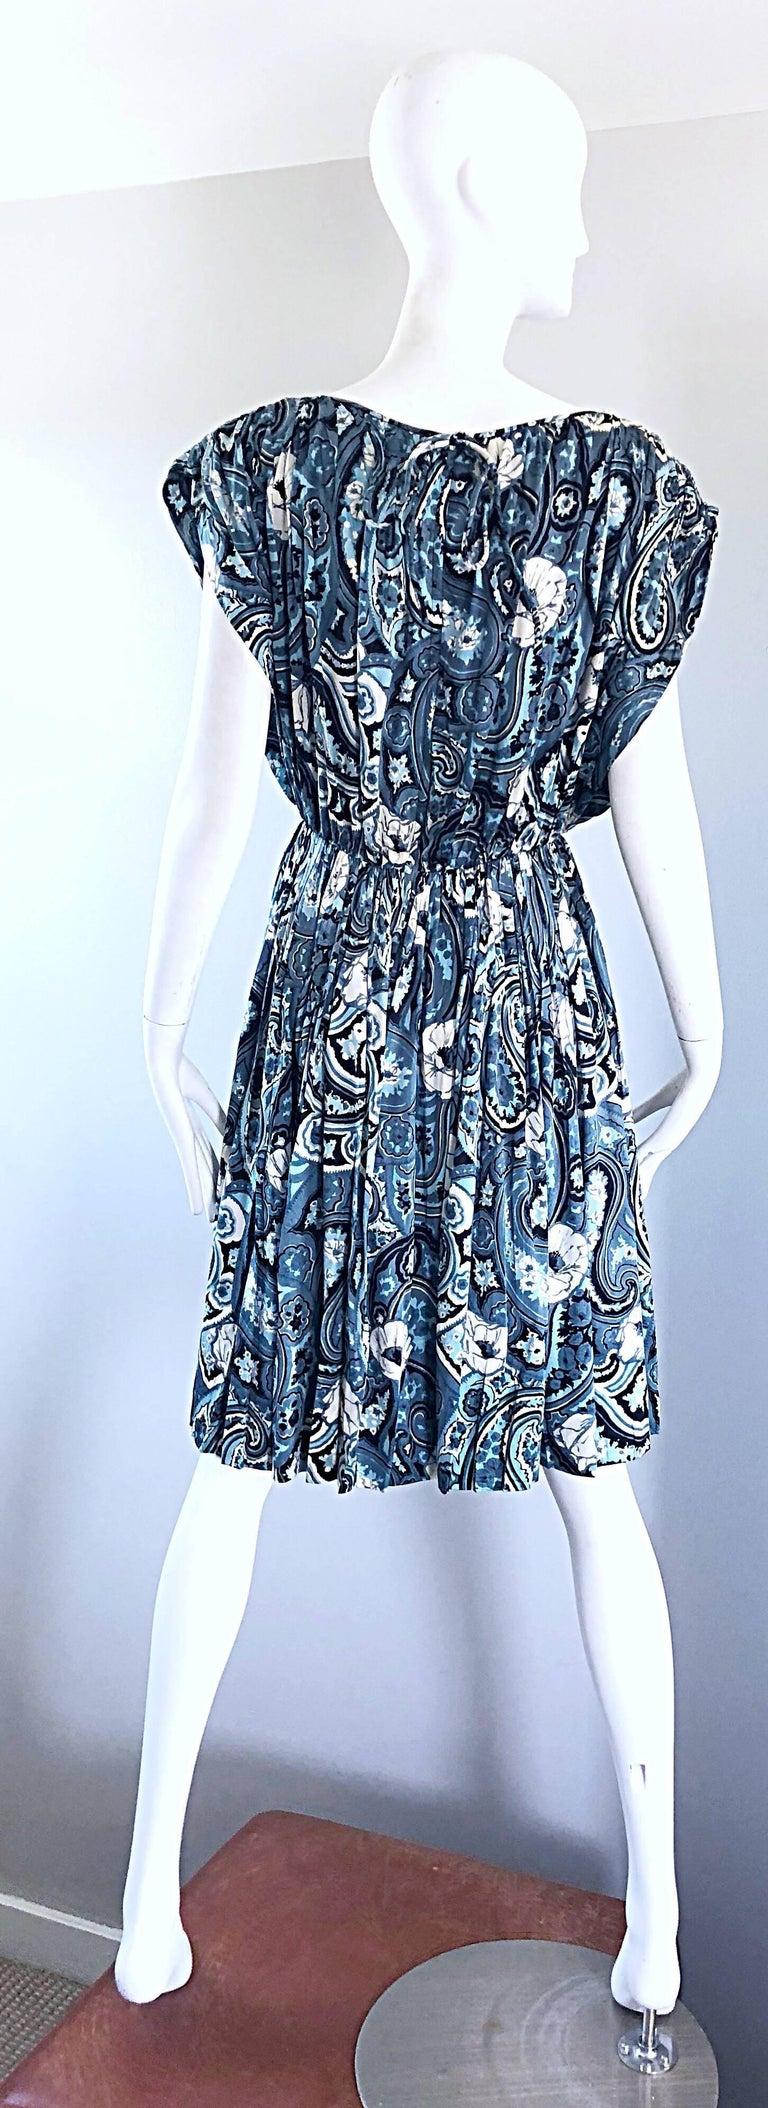 Women's Rare 1950s Townley Blue + White Paisley Flower Print Vintage 50s Dress For Sale